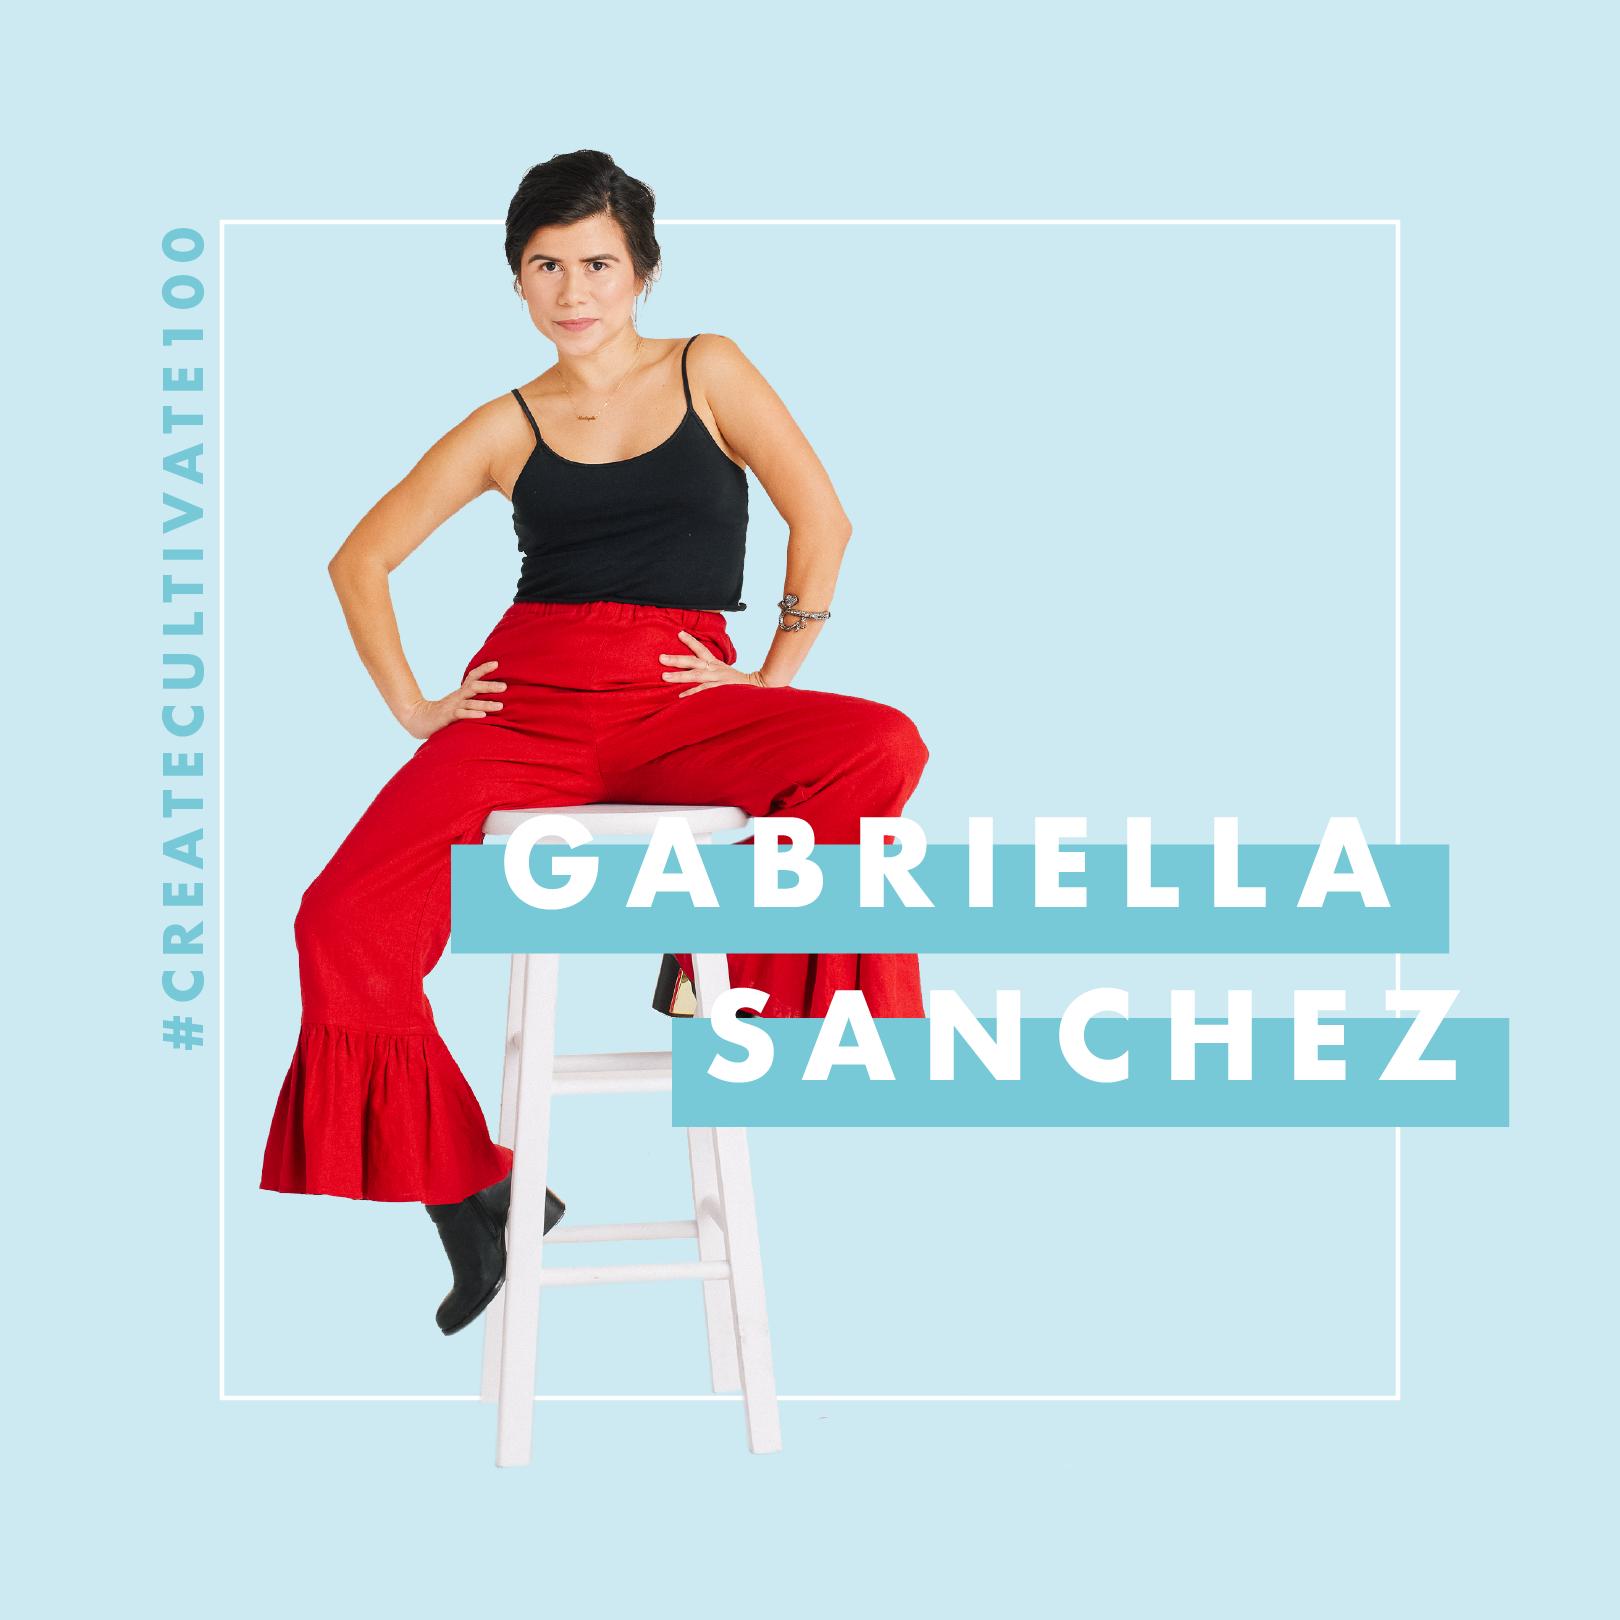 Gabriella_square.png